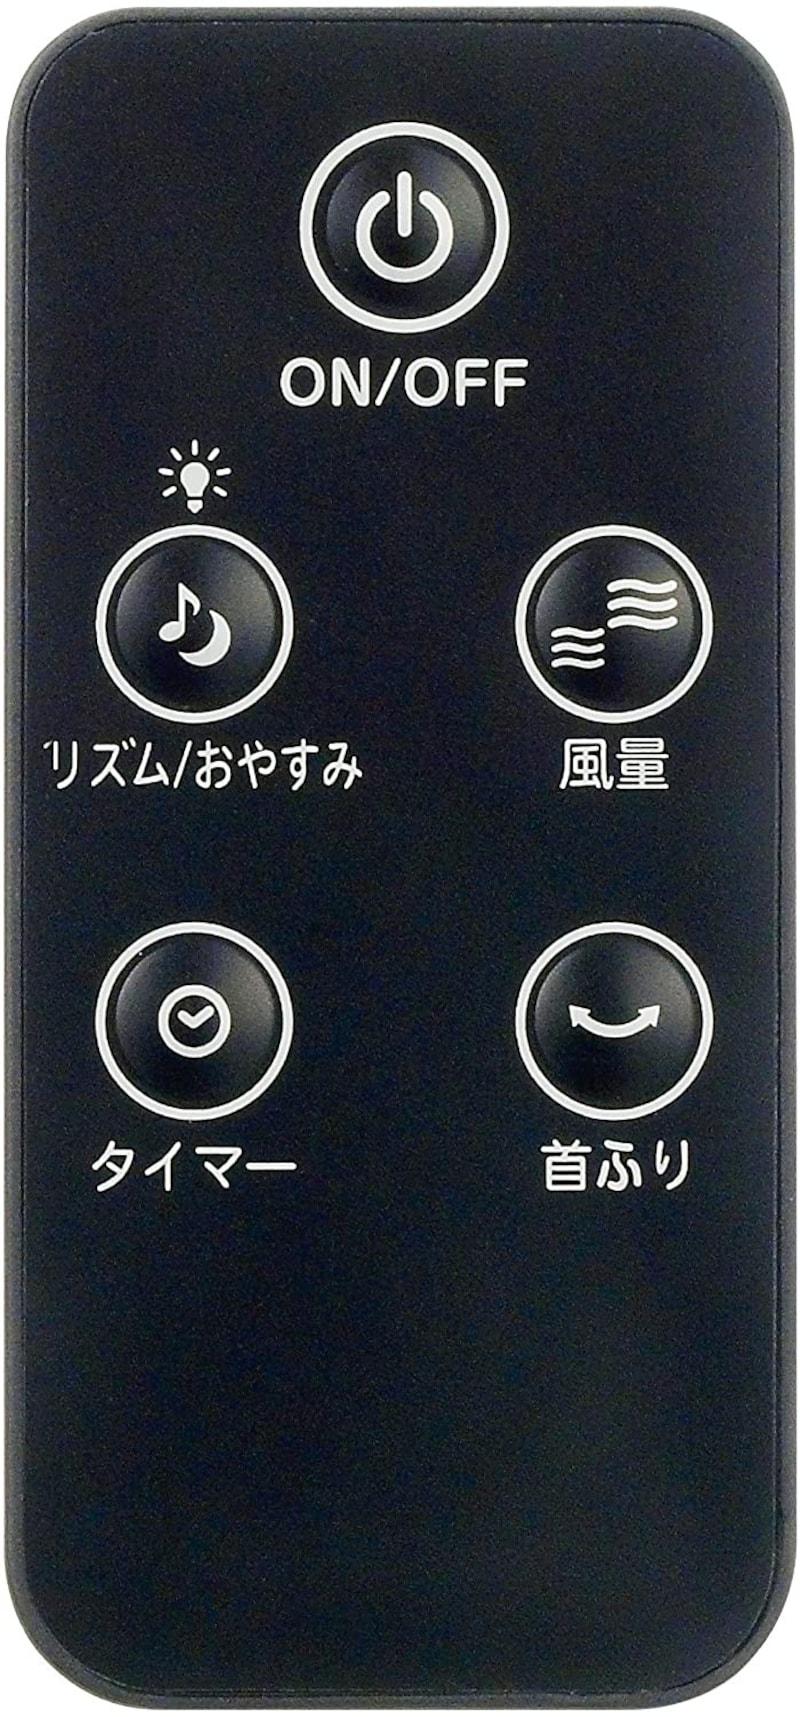 DOSHISHA(ドウシシャ),ピエリア 画像のリンク修正する,QIR-383